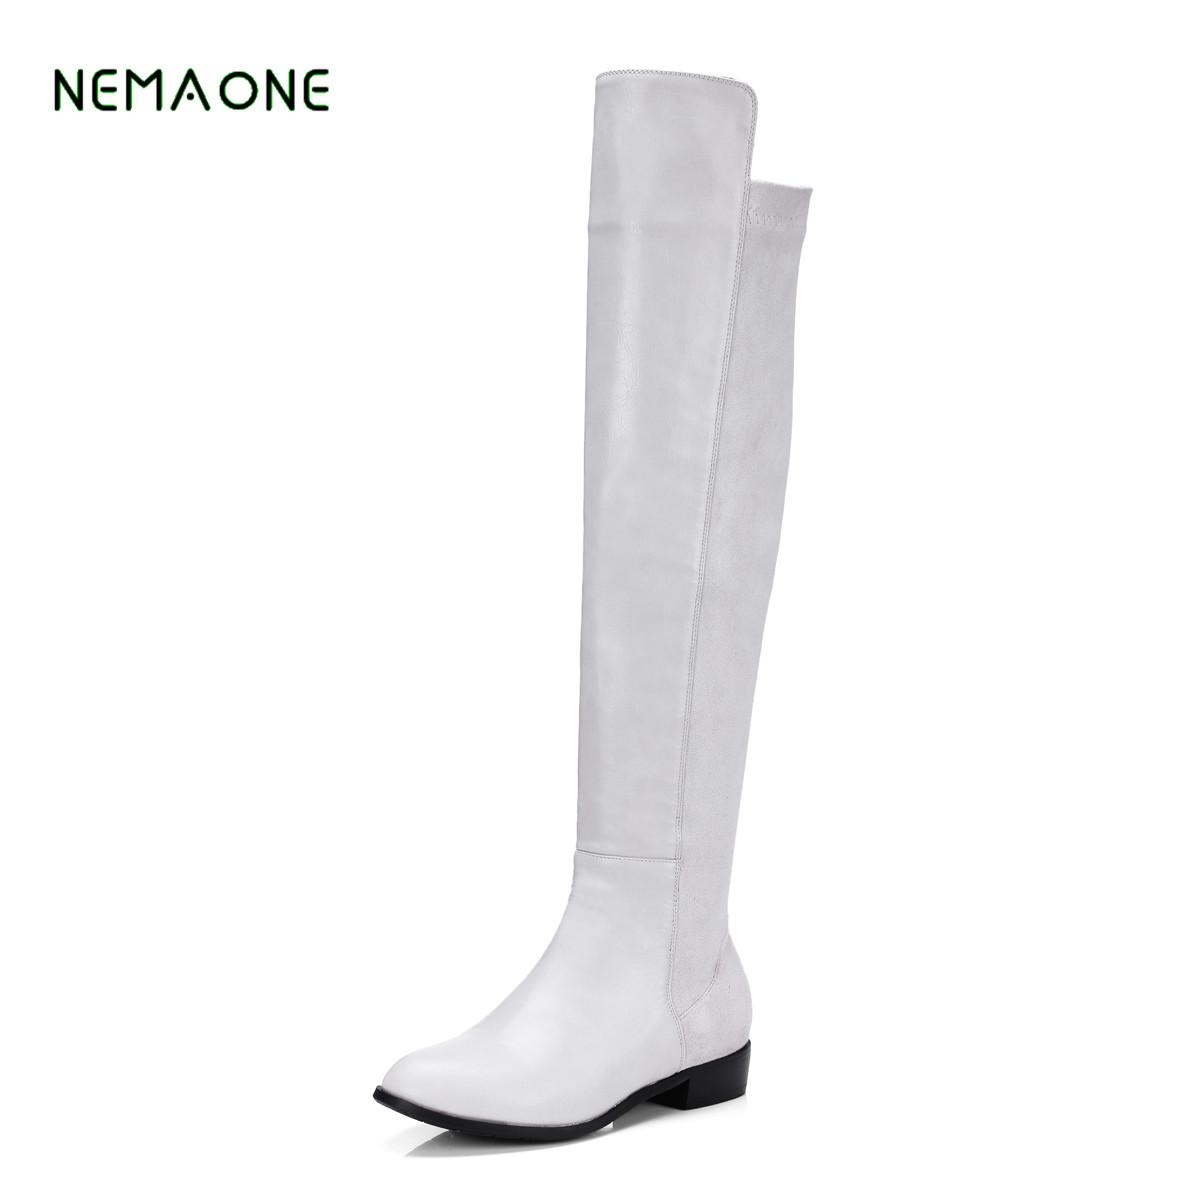 7ecaae3d08a NEMAONE 2019 new women winter shoes women's ankle boots the new ...